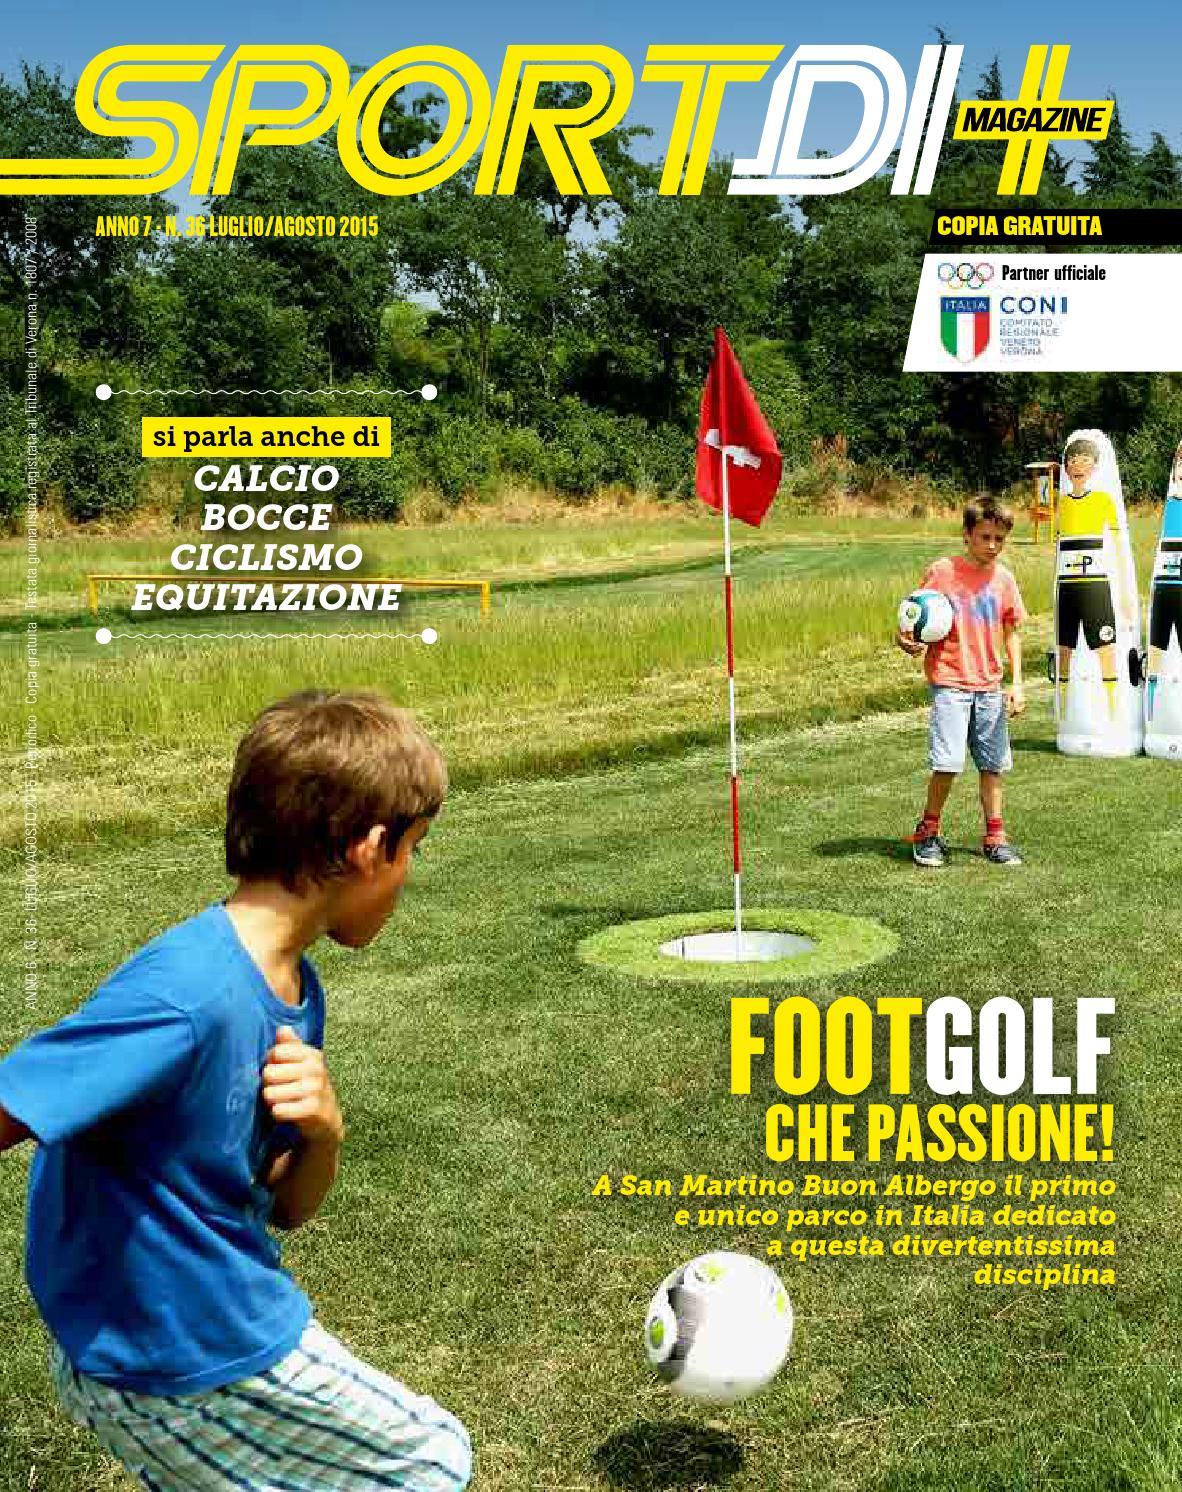 Sd Magazine 362015 By Sportdi Magazine Verona Issuu